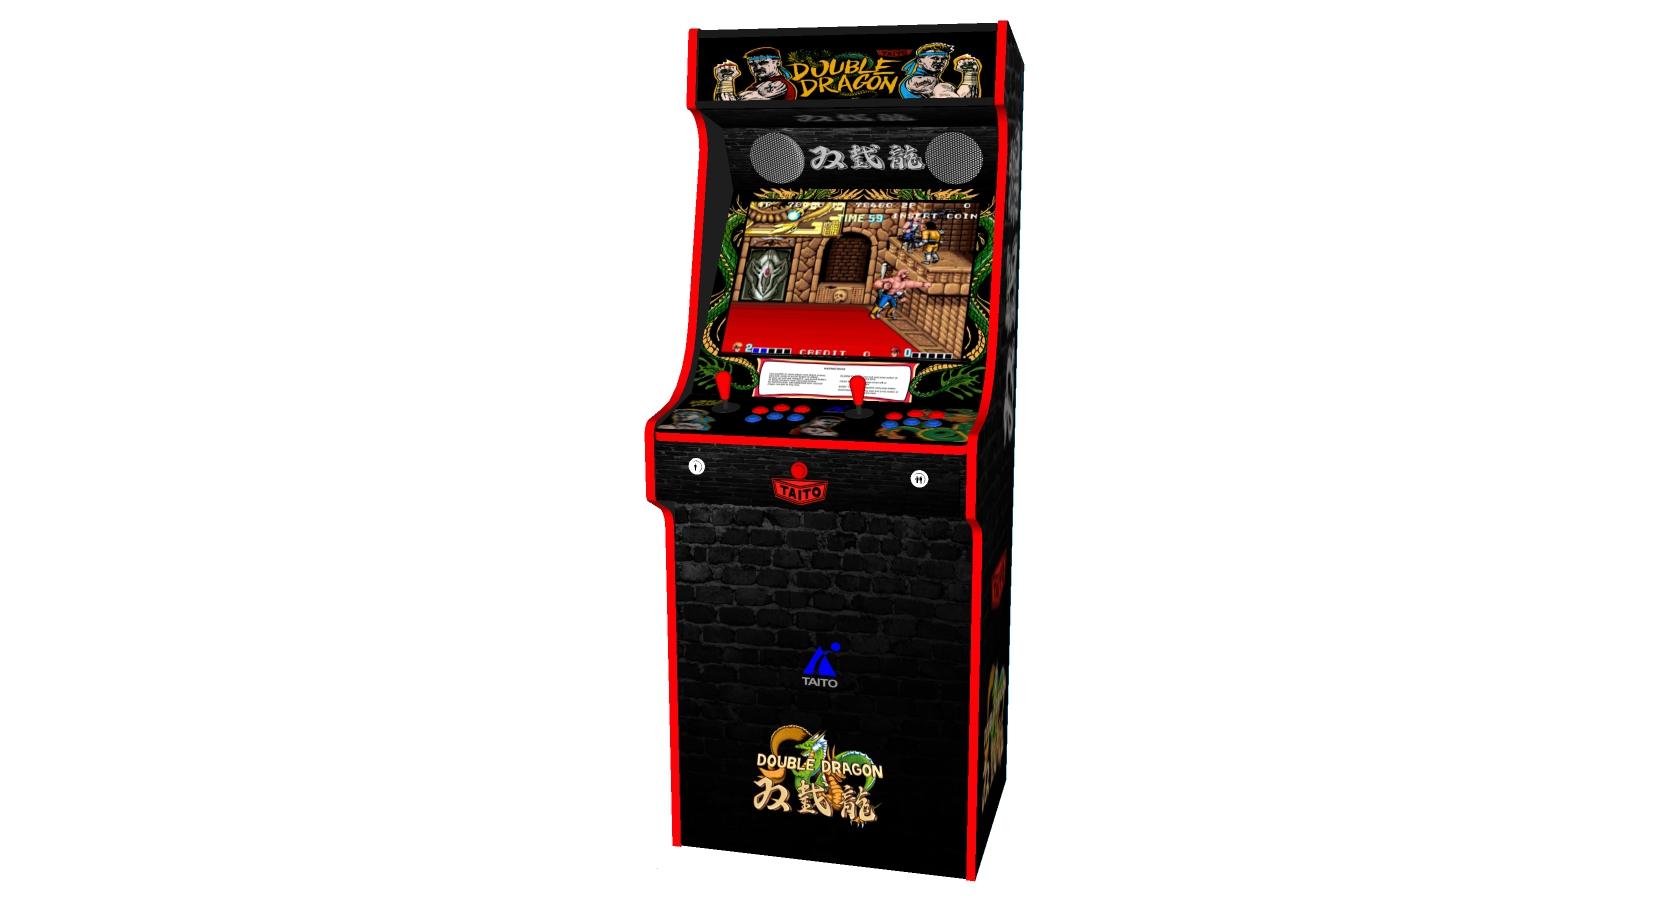 Classic Upright Arcade Machine - Double Dragon Theme v2 3000 games - Centre